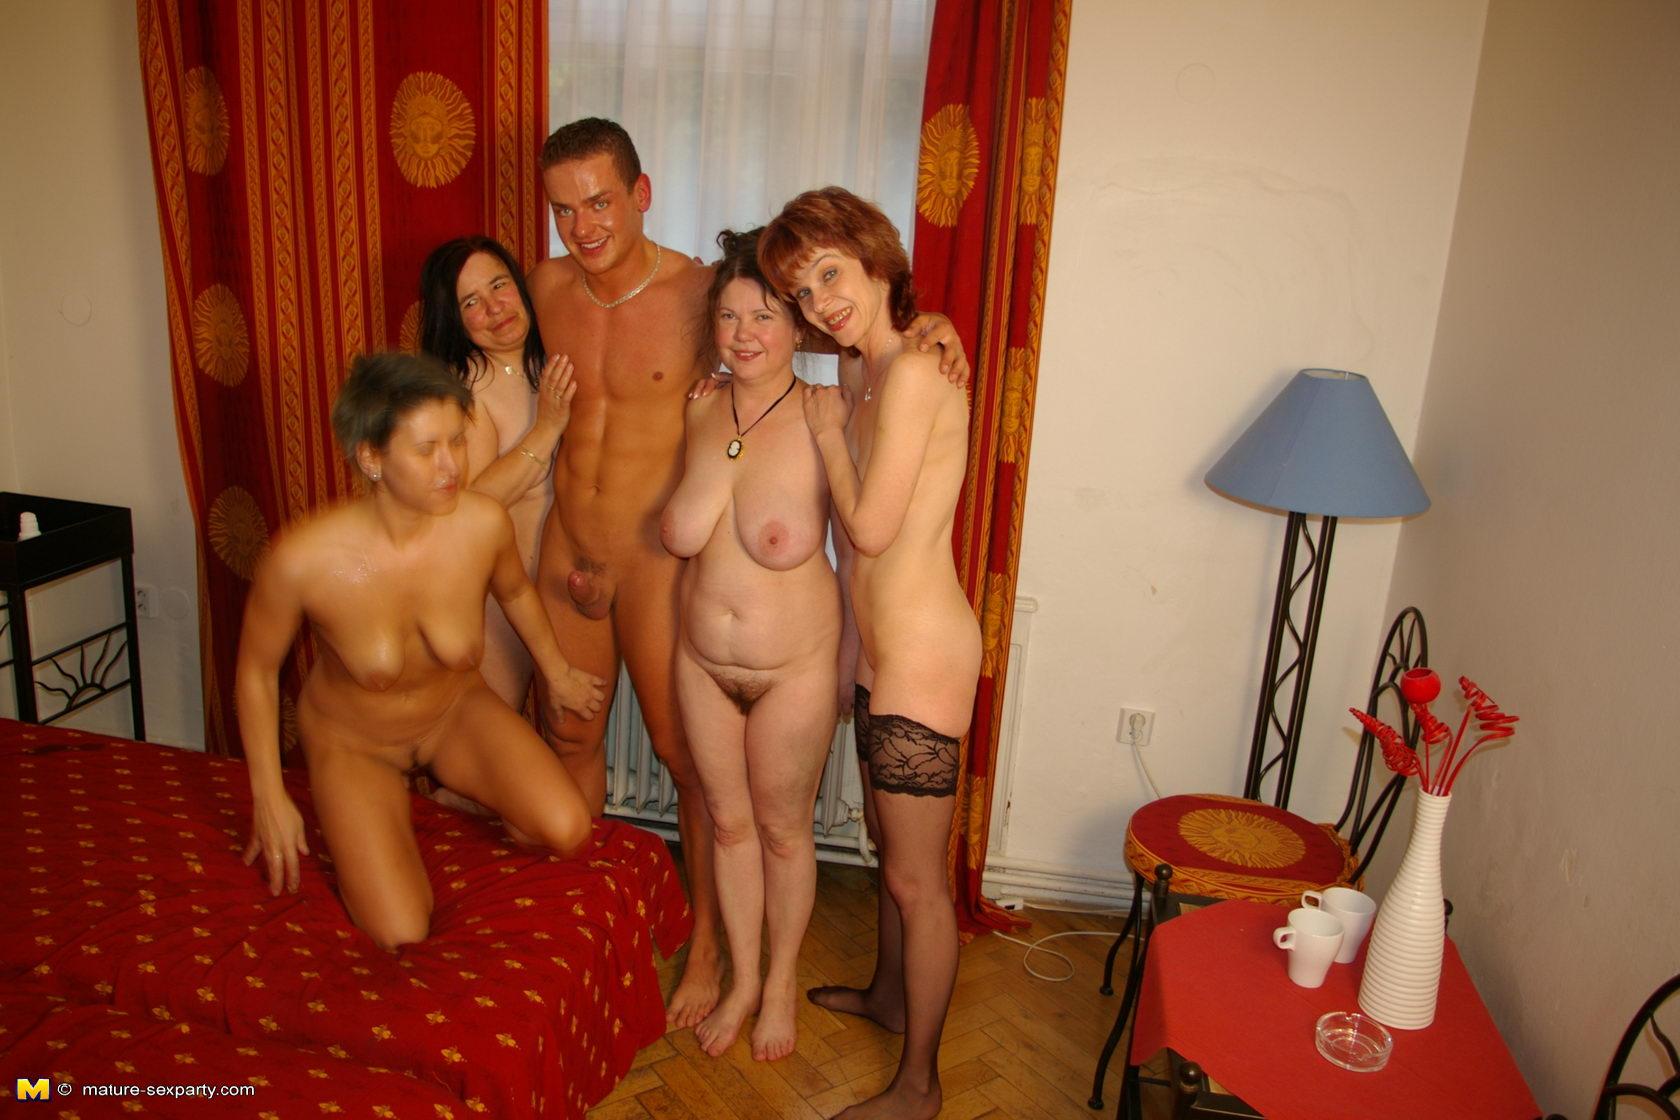 mature amature party nudes